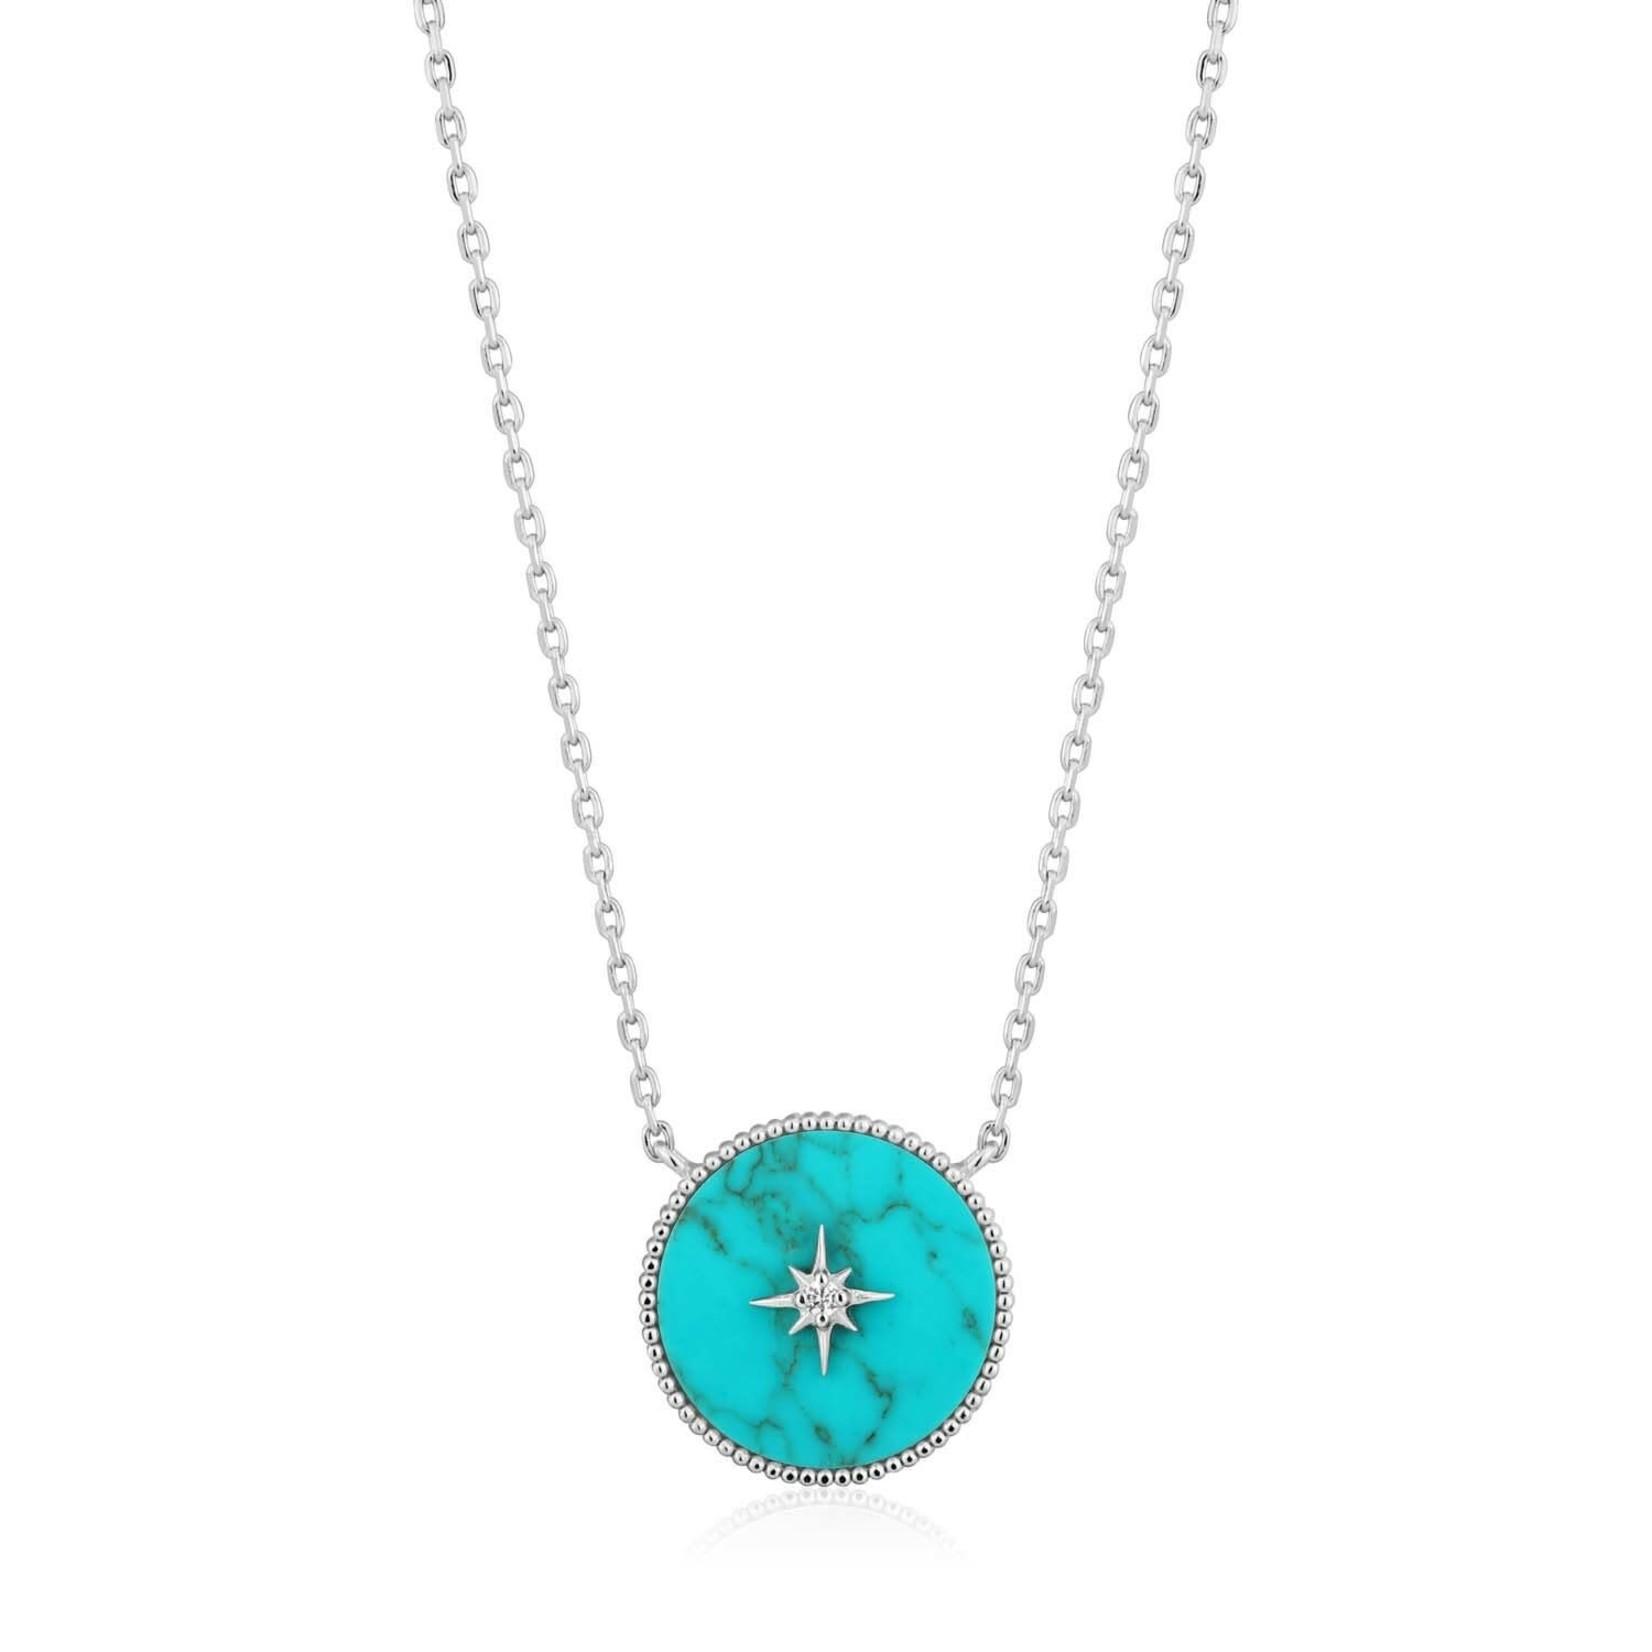 Ania Haie Turquoise Emblem Necklace